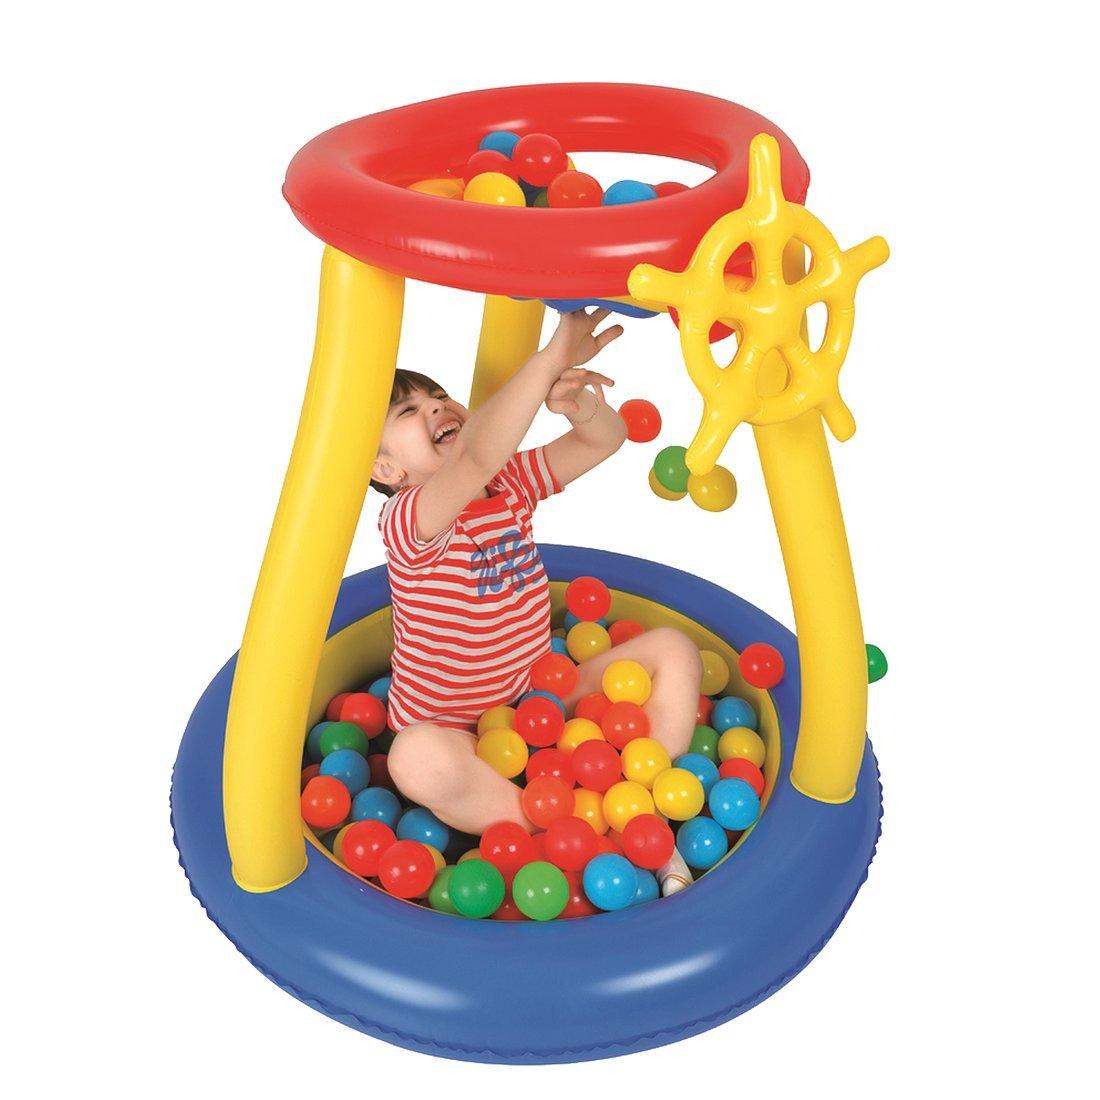 25 B/älle Jilong Pit Ball Pool /Ø93x96cm B/ällebad mit Spielb/älle Planschbecken Kinderpool Becken inkl